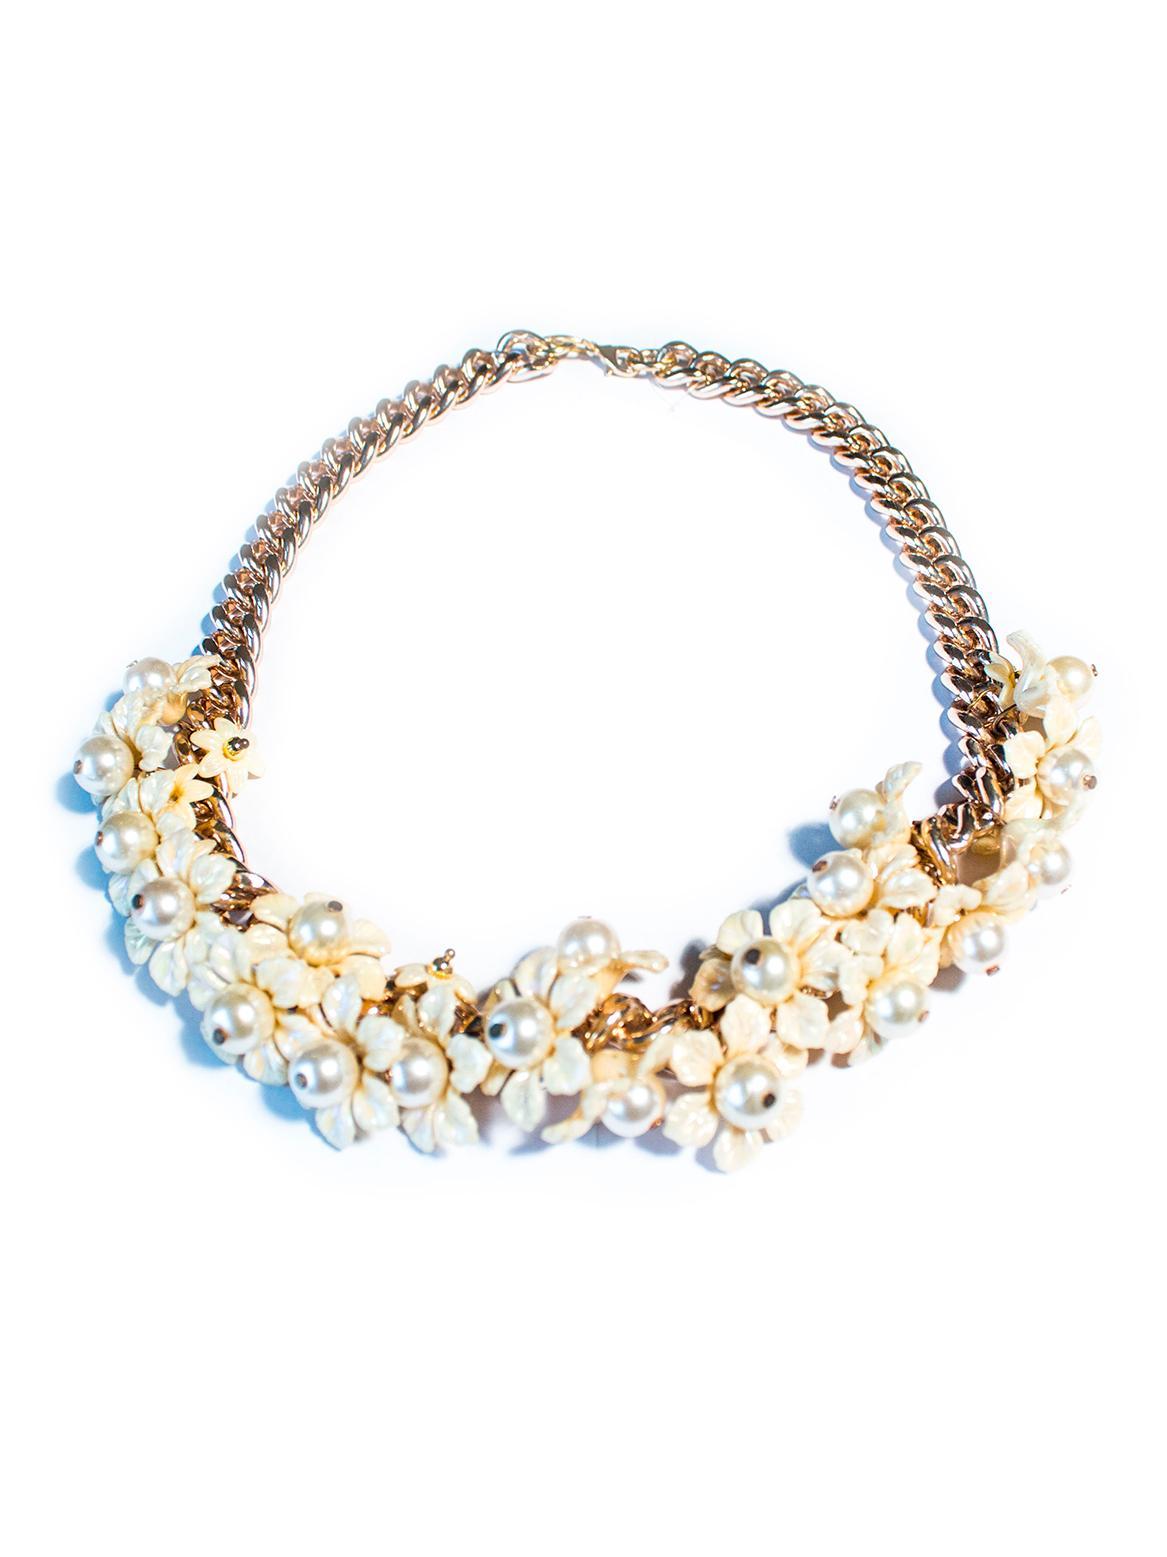 Asesoría de imagen ejecutiva - Collar floral power - Hard Chic - VIPSOUL